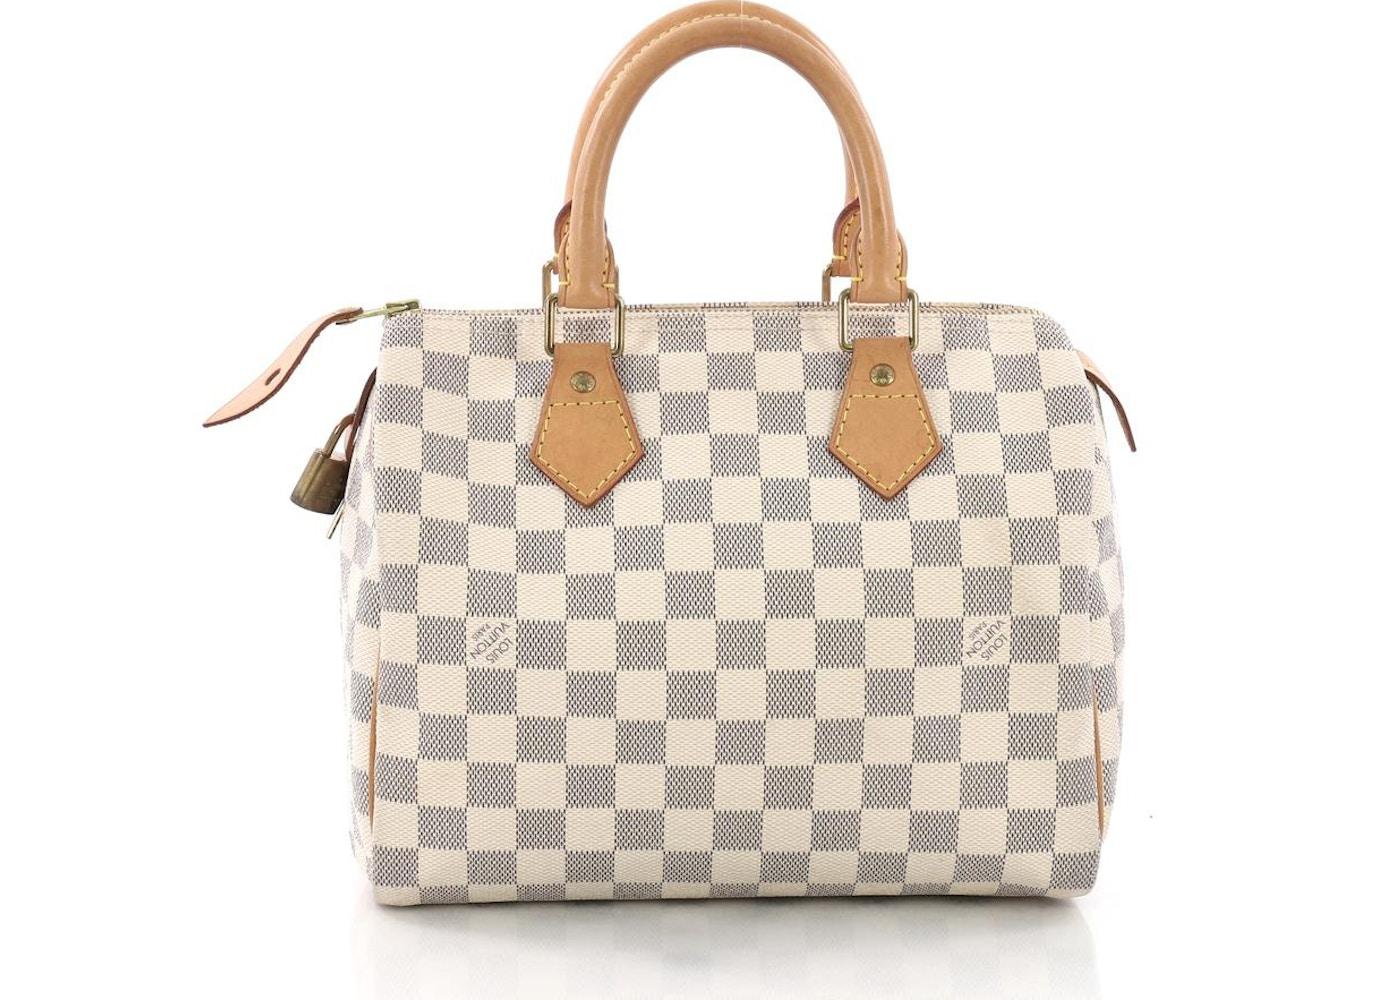 50ea0efc54 Sell. or Ask. View All Bids. Louis Vuitton Speedy Damier Azur ...